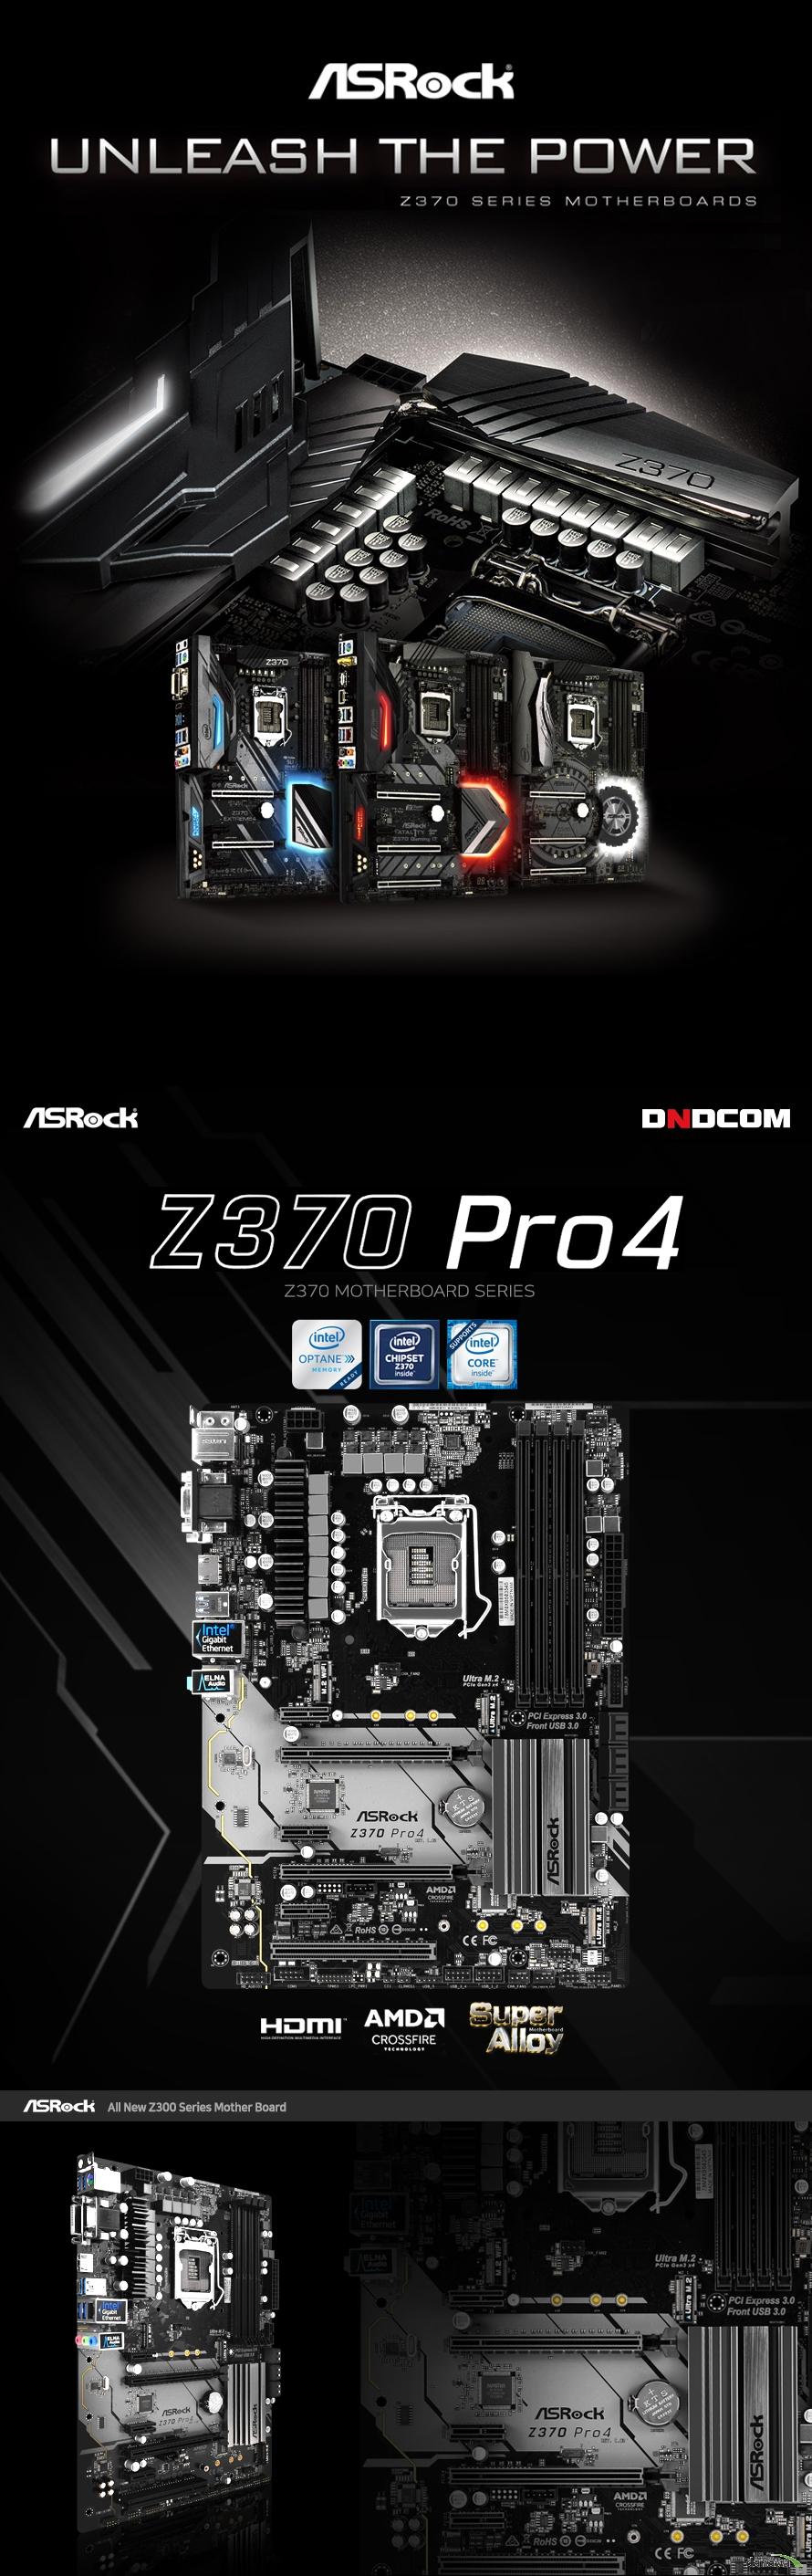 unleash the power ASRock z370 pro4 디앤디컴